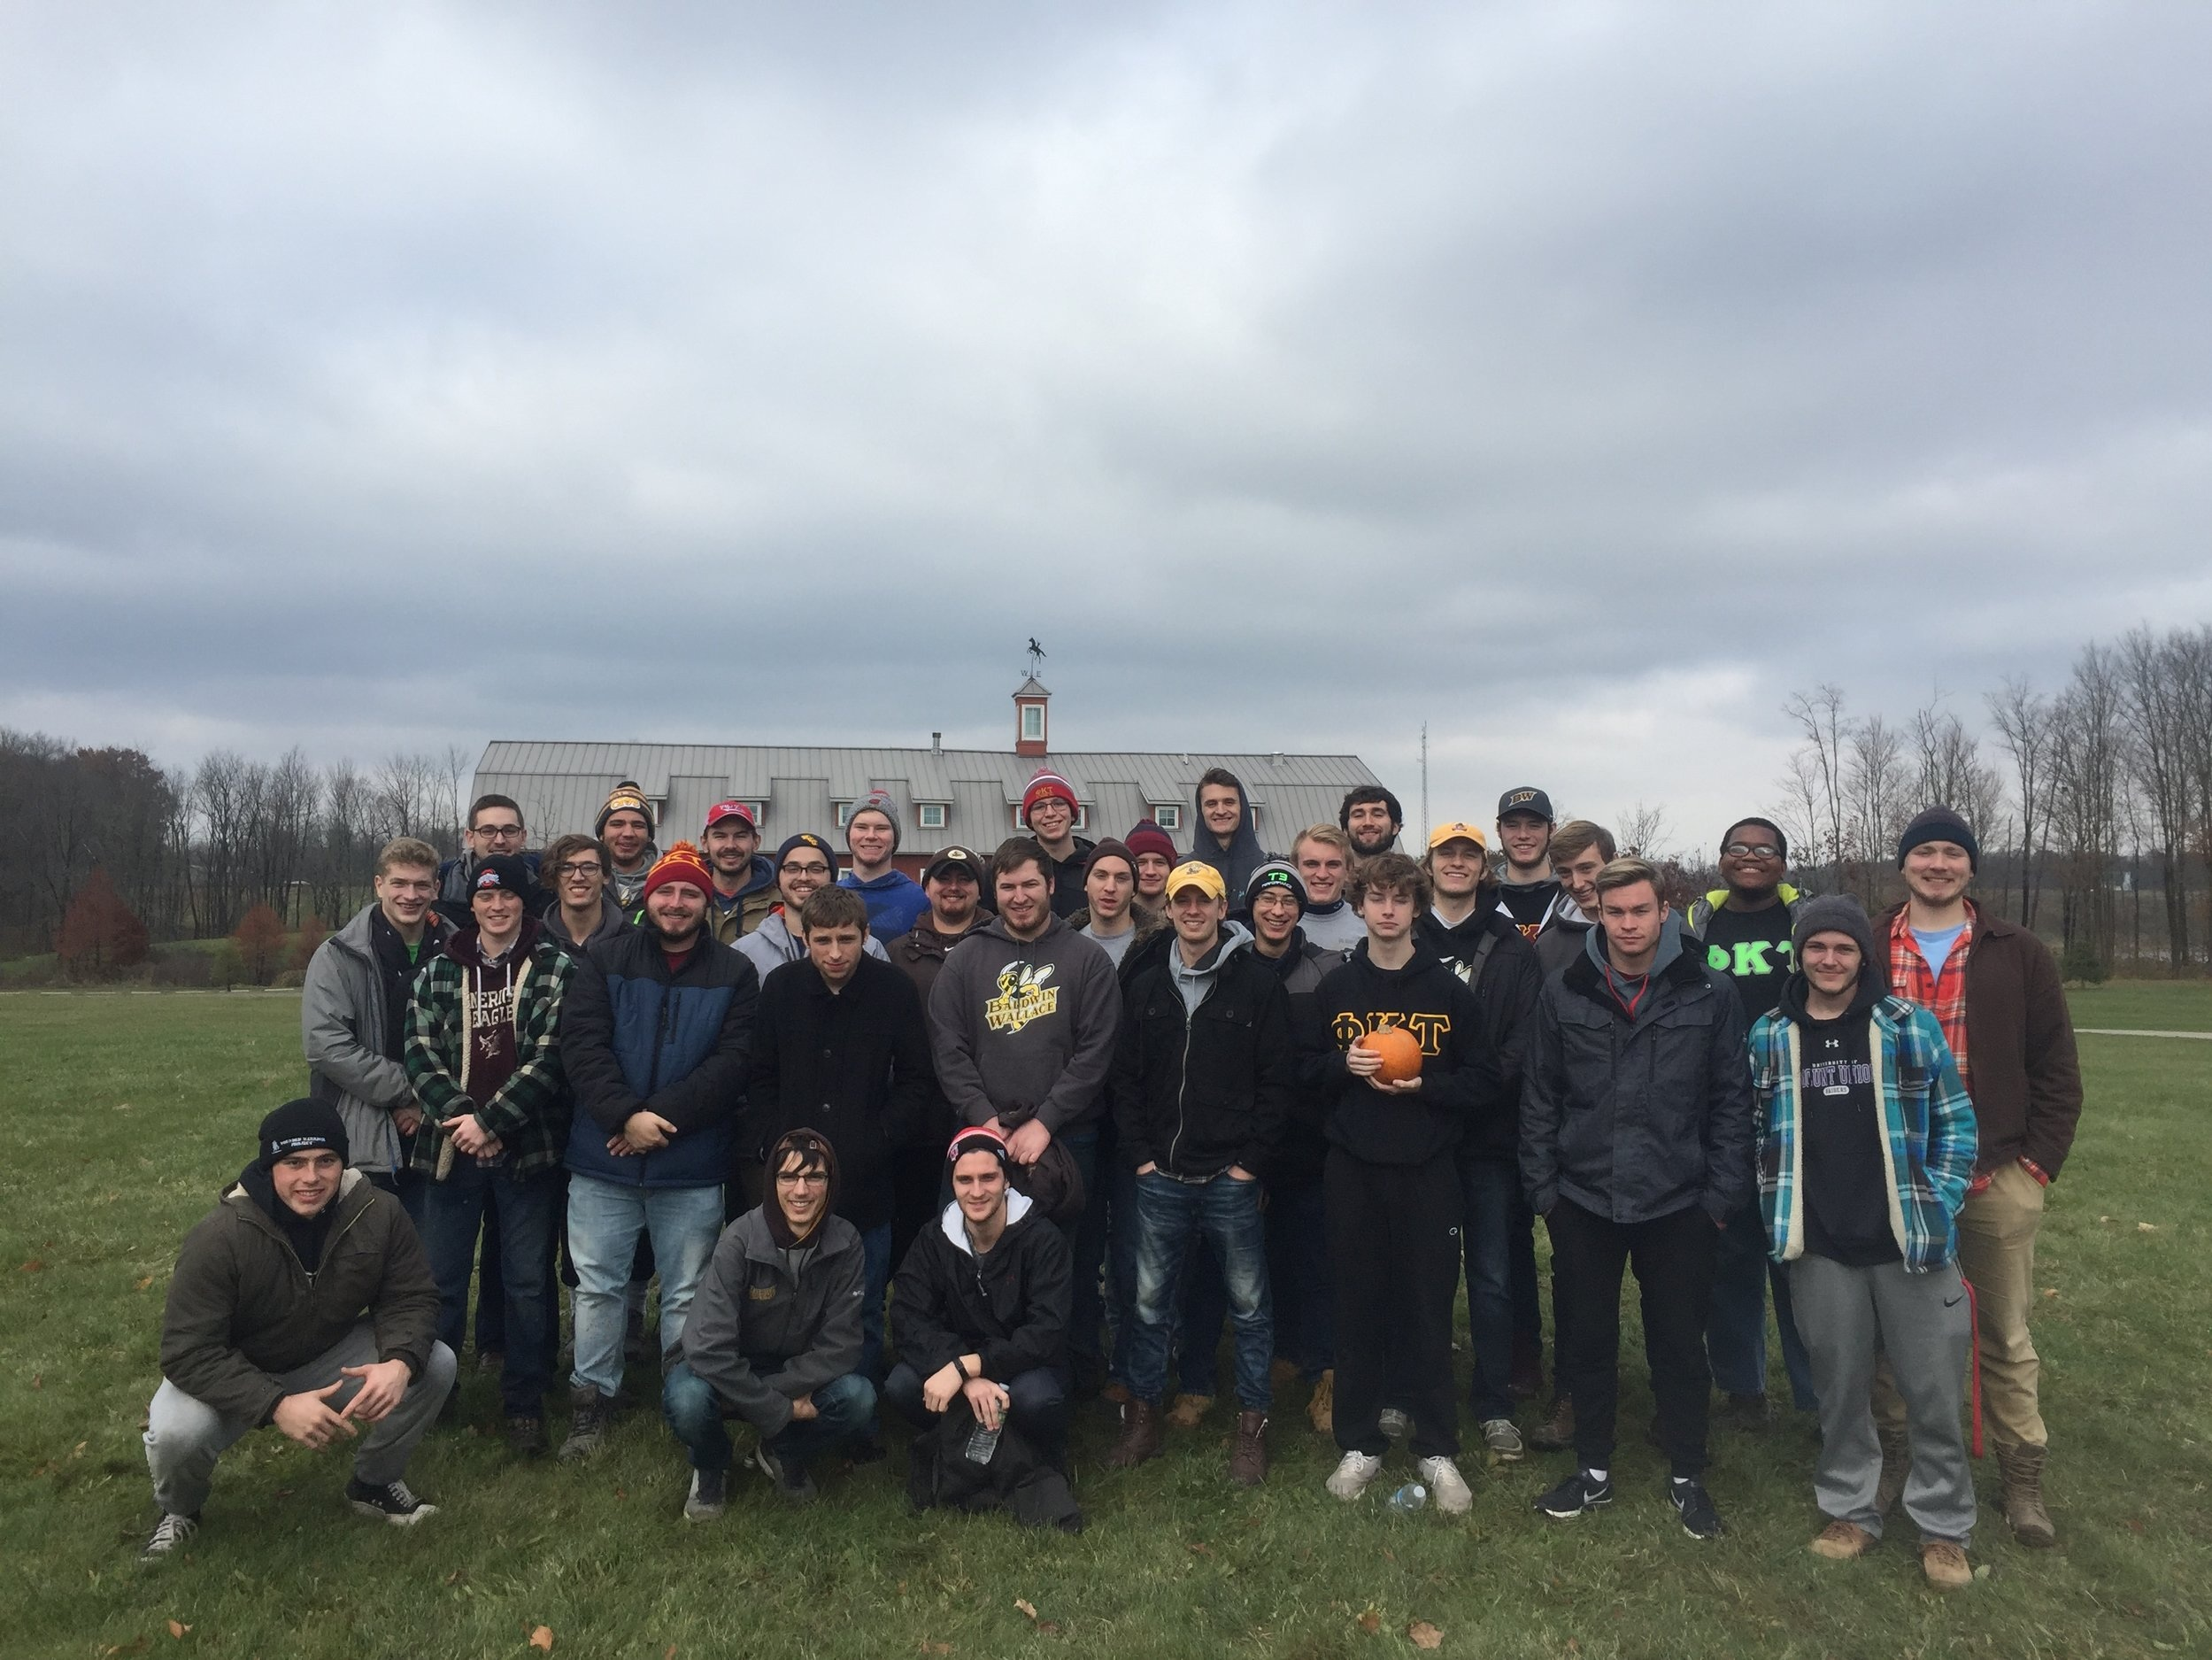 NCSE FHF 2018 Group Photo.JPG